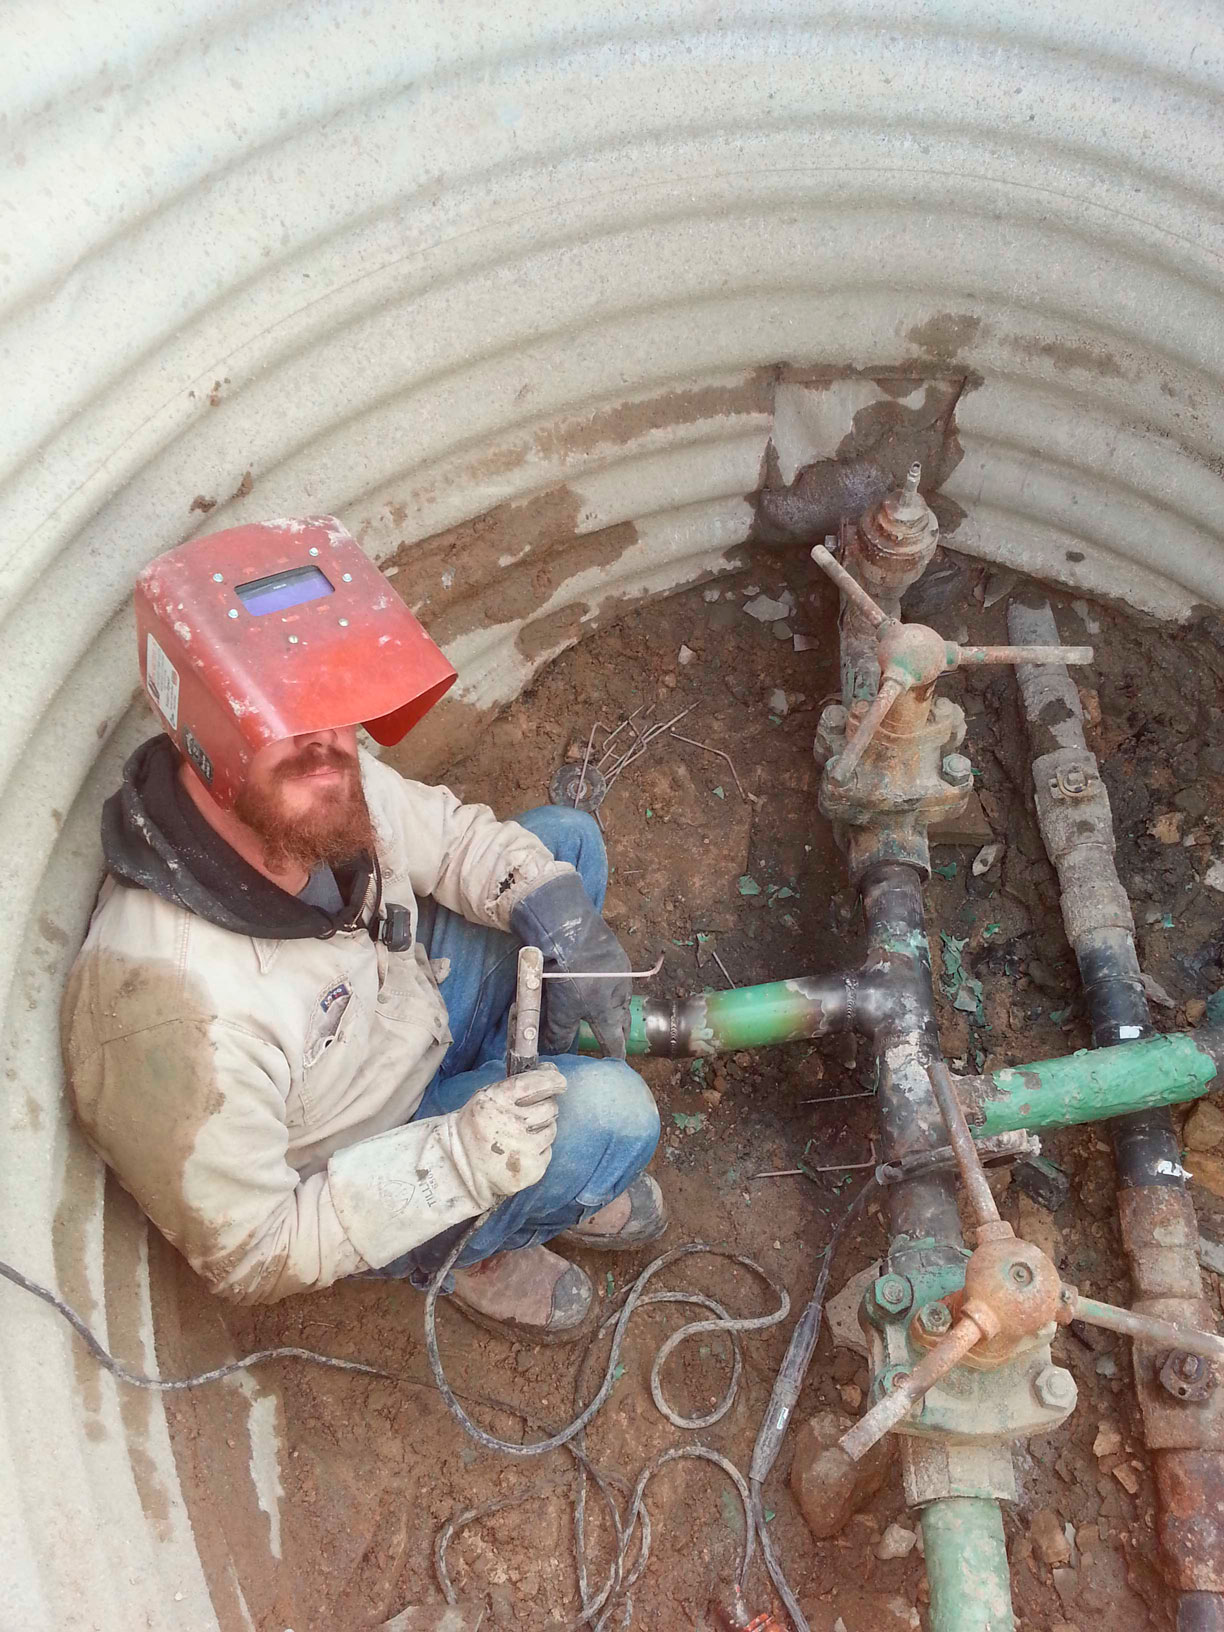 Rob in cellar repairing line leak